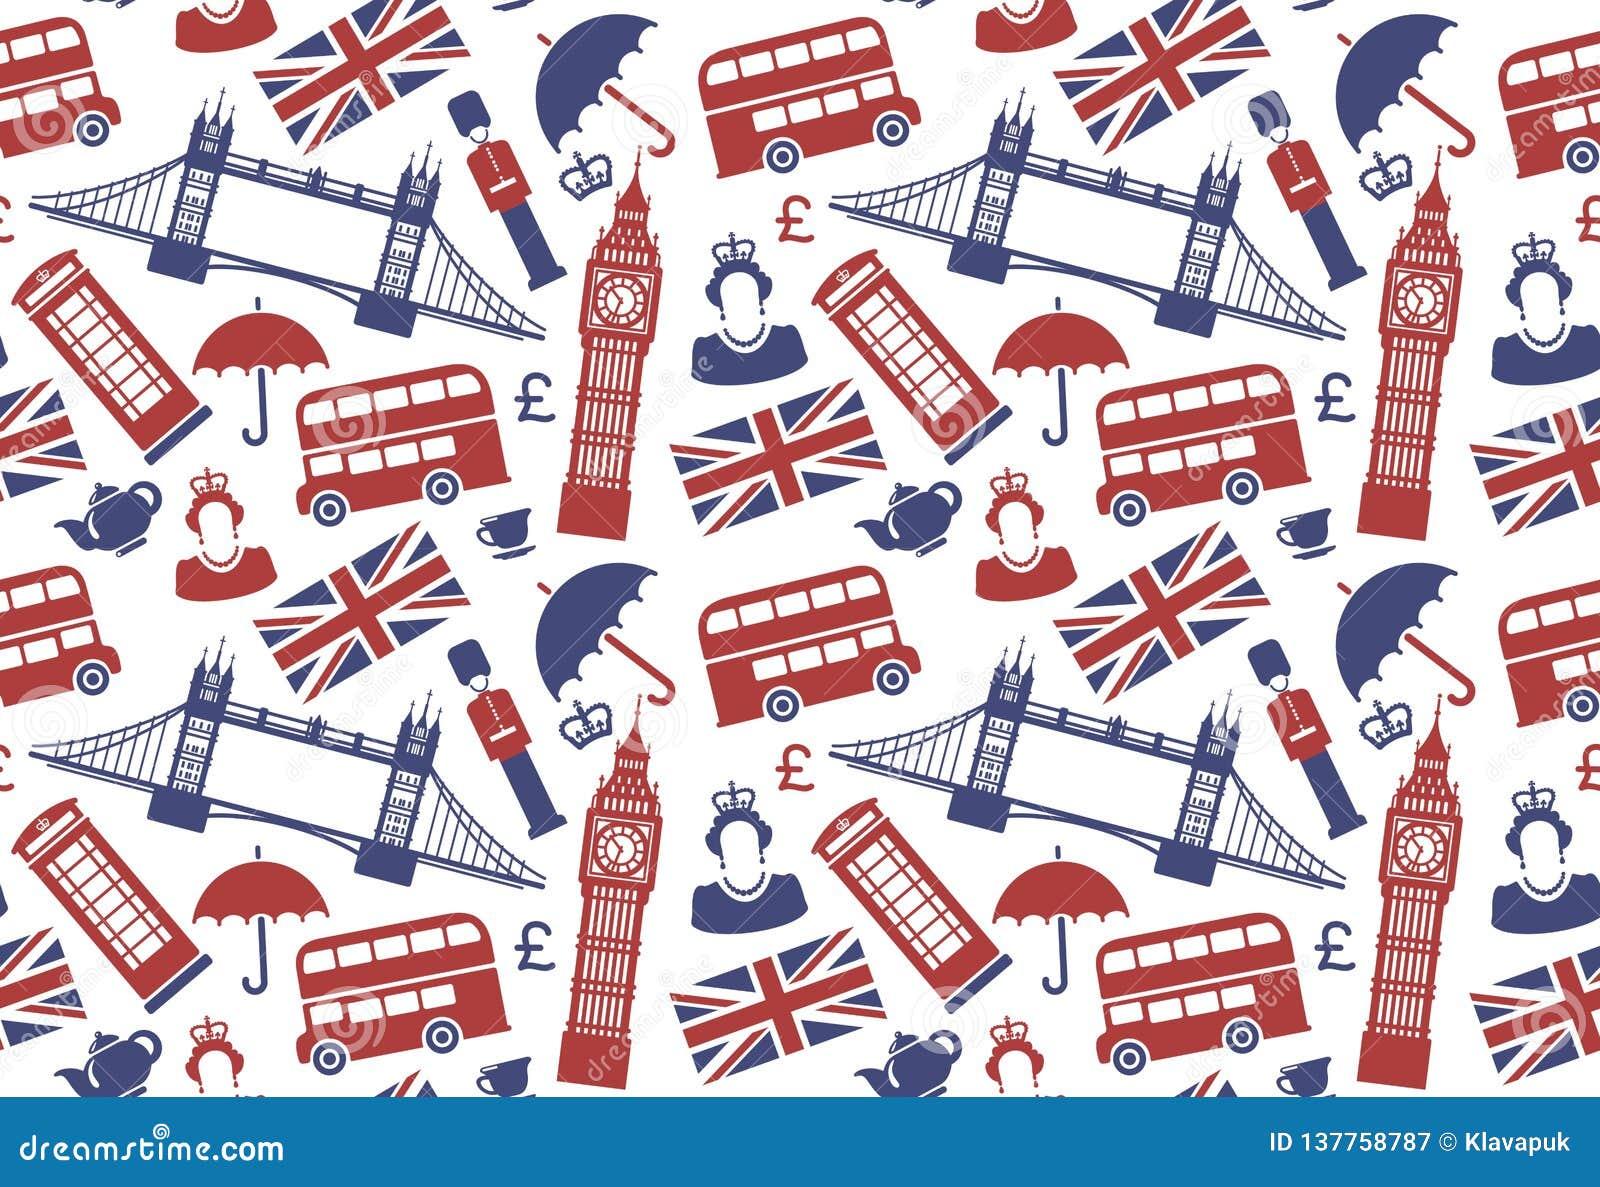 Fondo inconsútil con símbolos tradicionales de Inglaterra